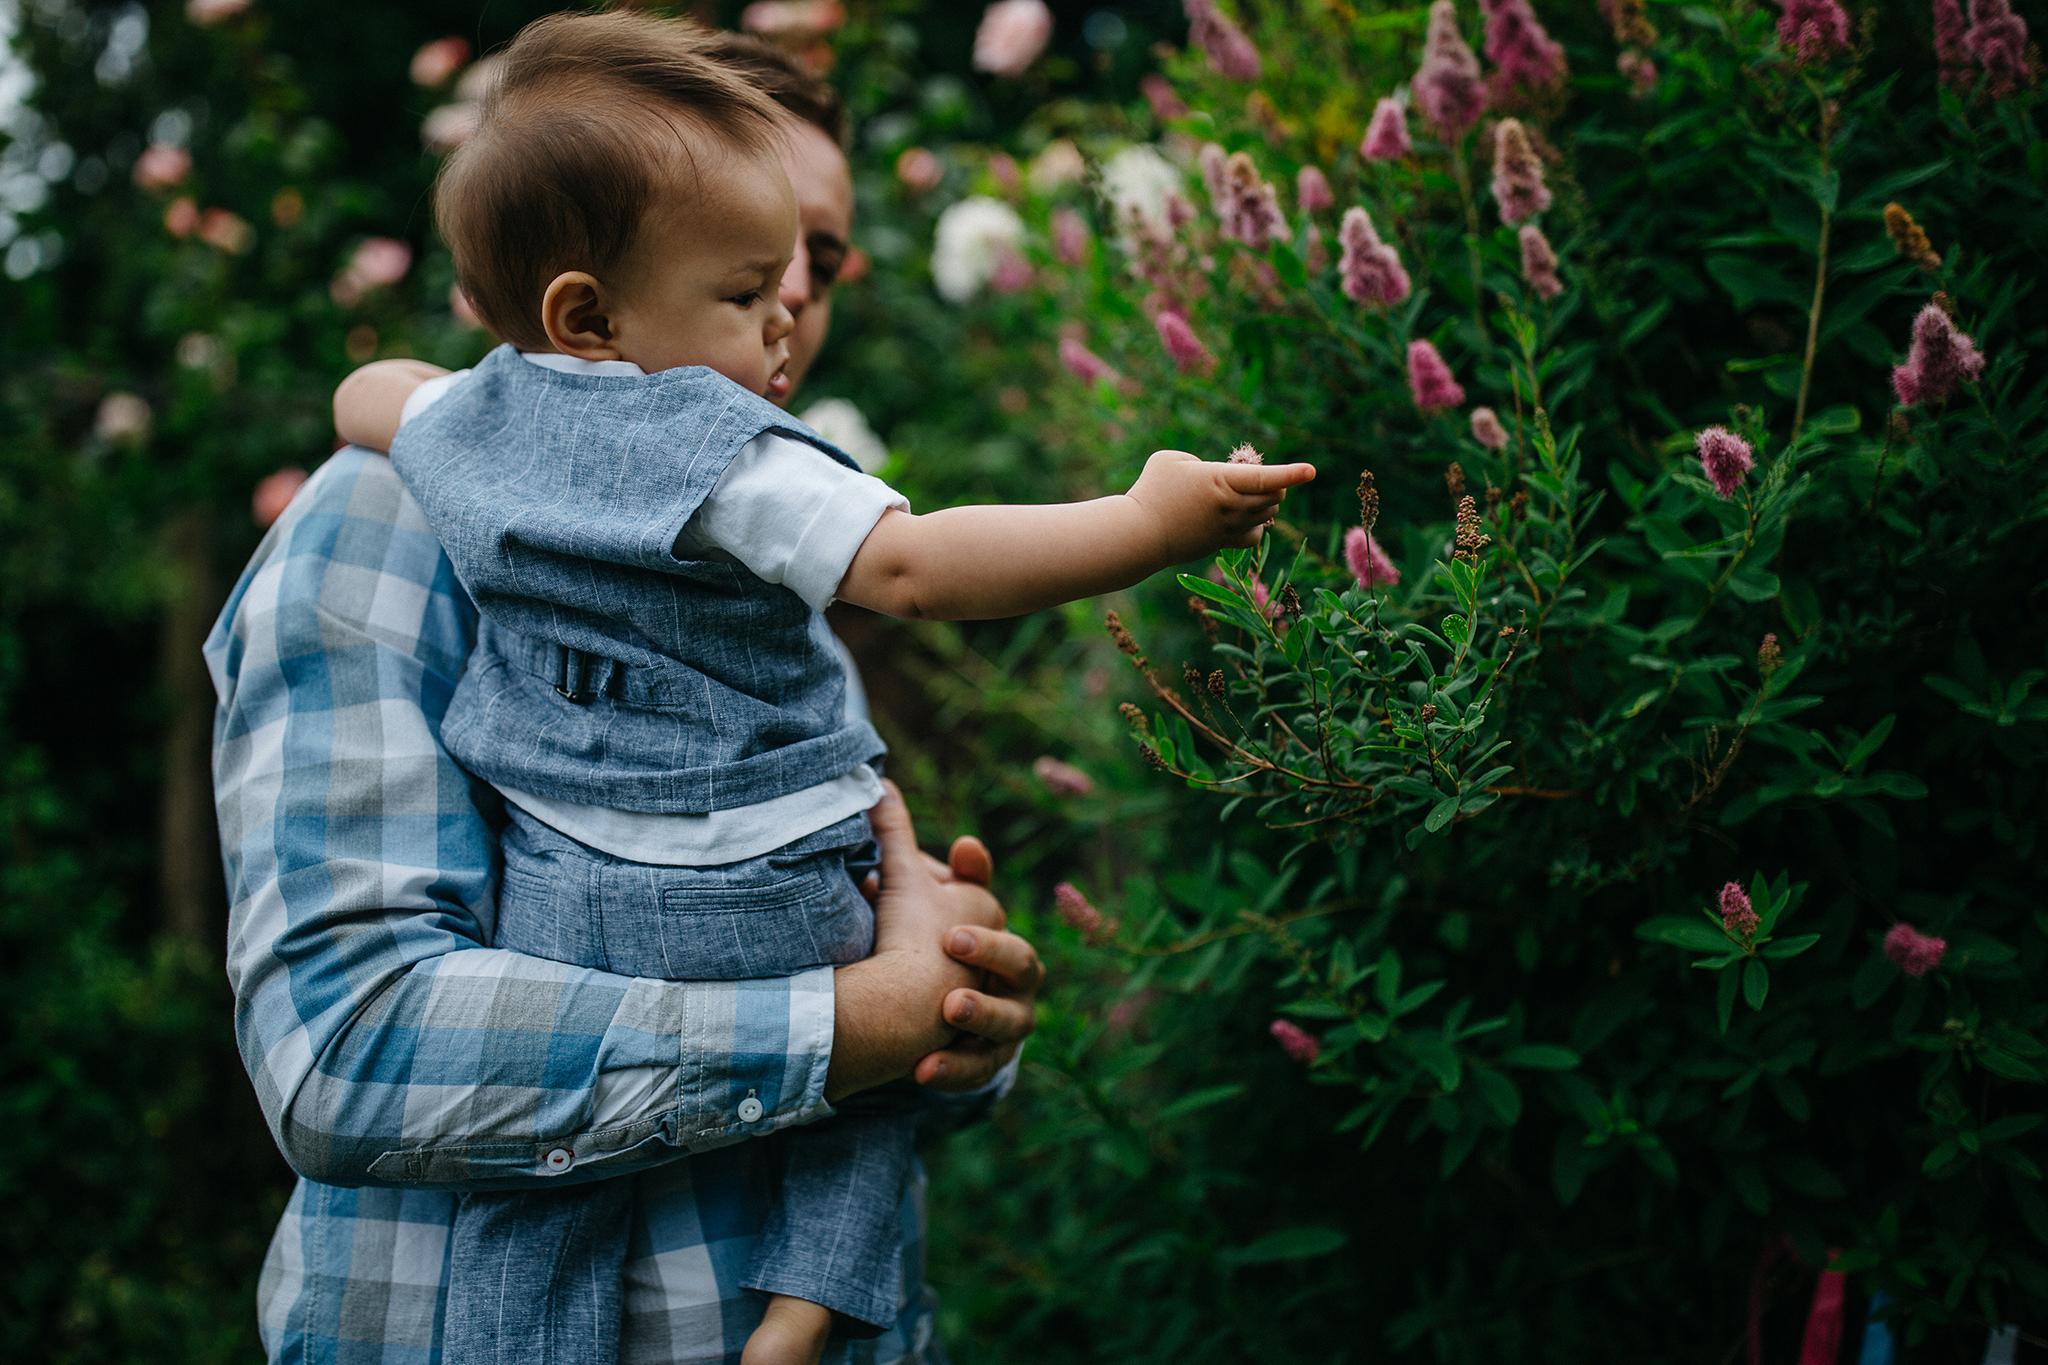 Iva-Dahan-Photography-Surrey-Photographer033.jpg